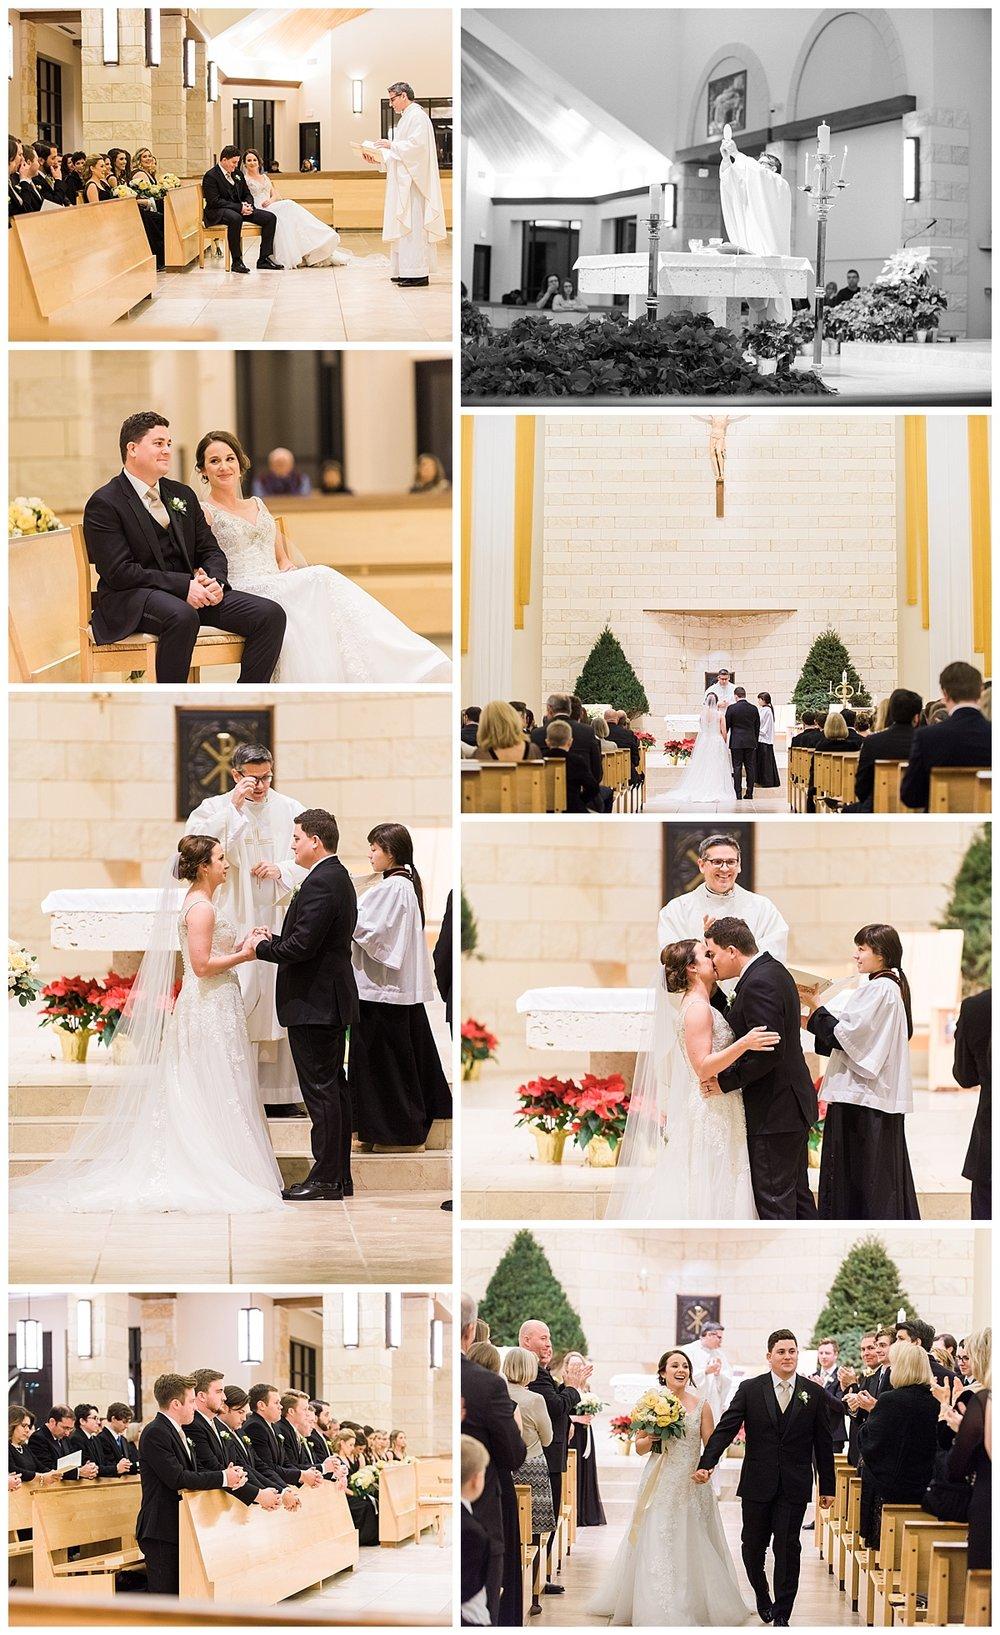 the-cotton-mill-wedding-ar-photography-17.jpg